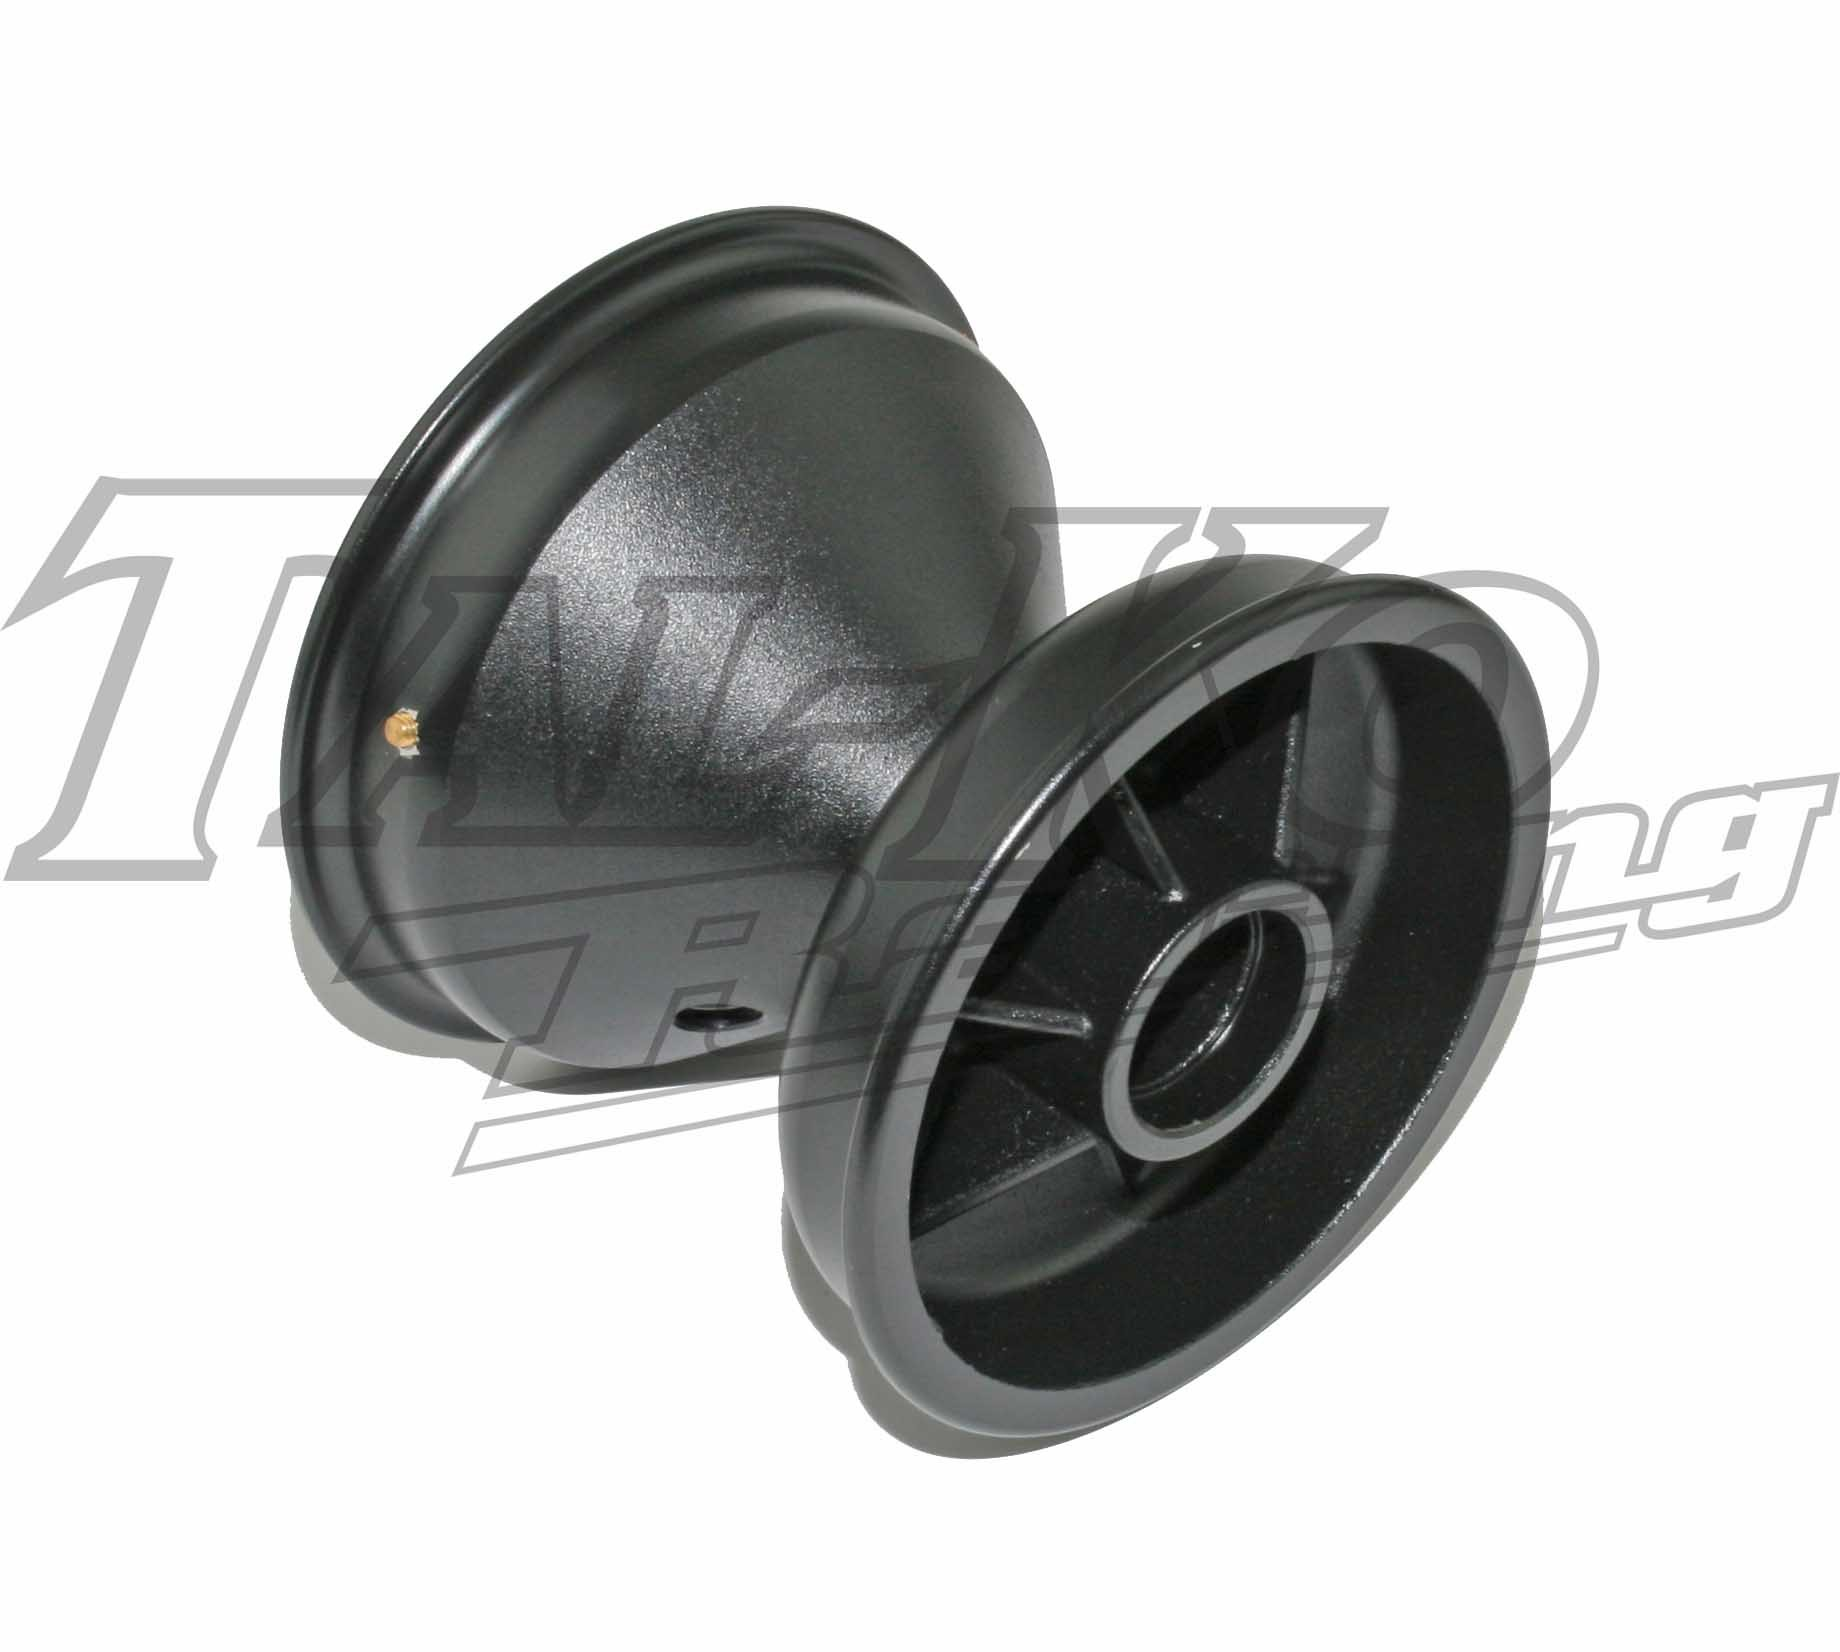 CRG FRONT WHEEL MAG F124-17mm BLACK